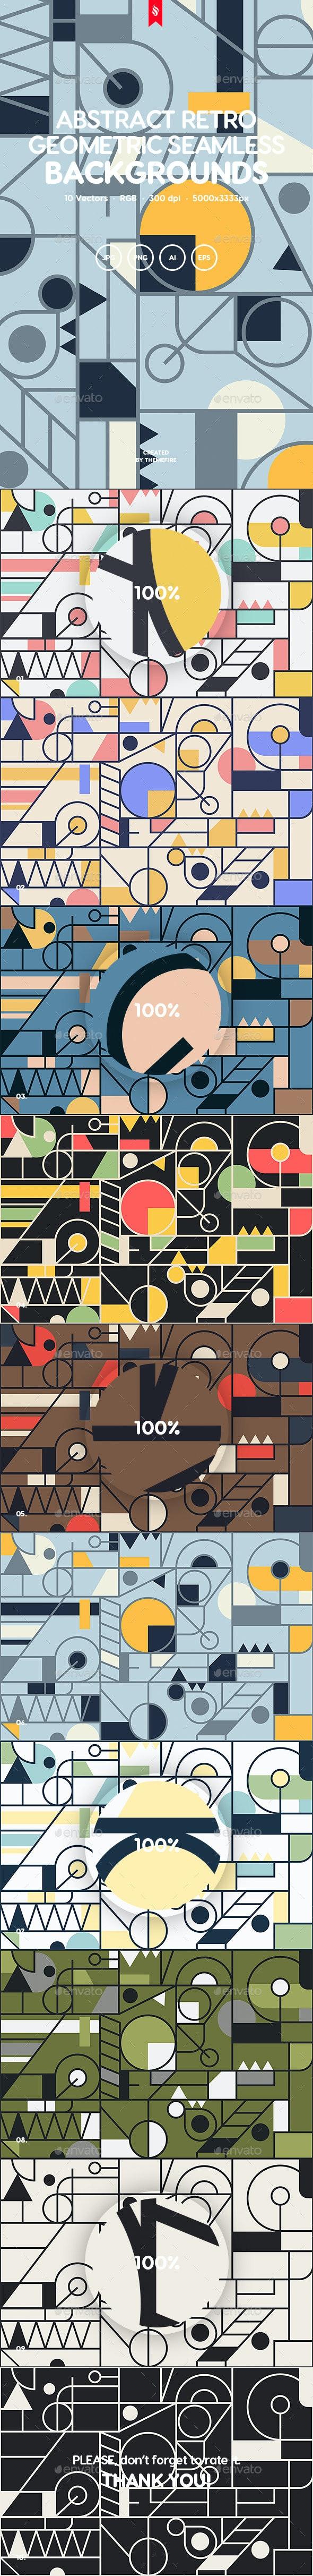 Retro Geometric Ornament Seamless Patterns - Backgrounds Graphics